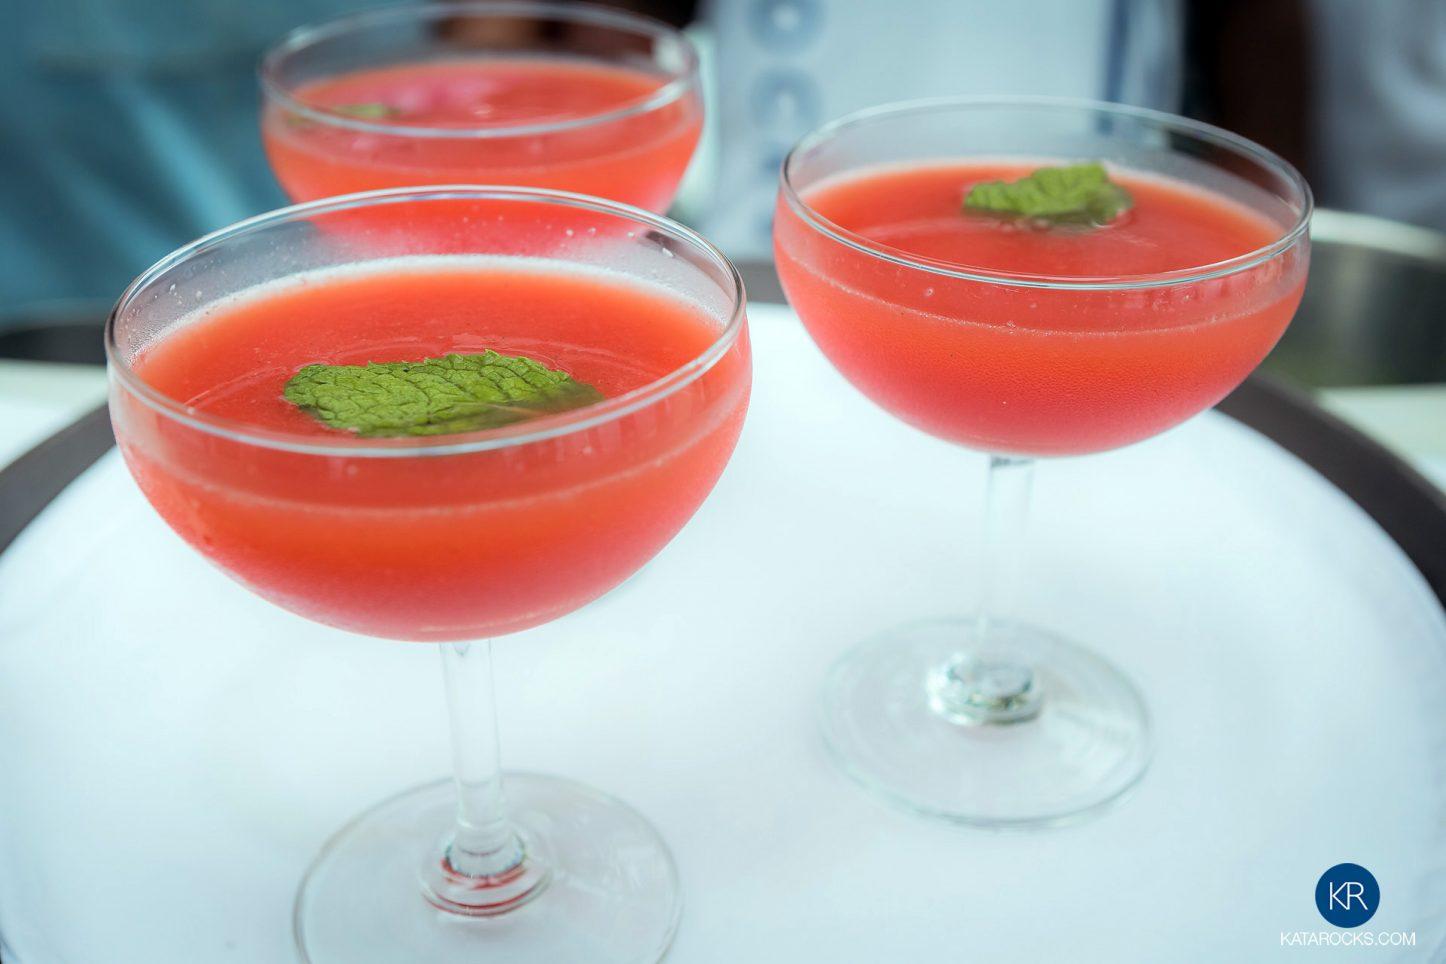 Kata Rocks celebrates Fourth Anniversary - Cocktails